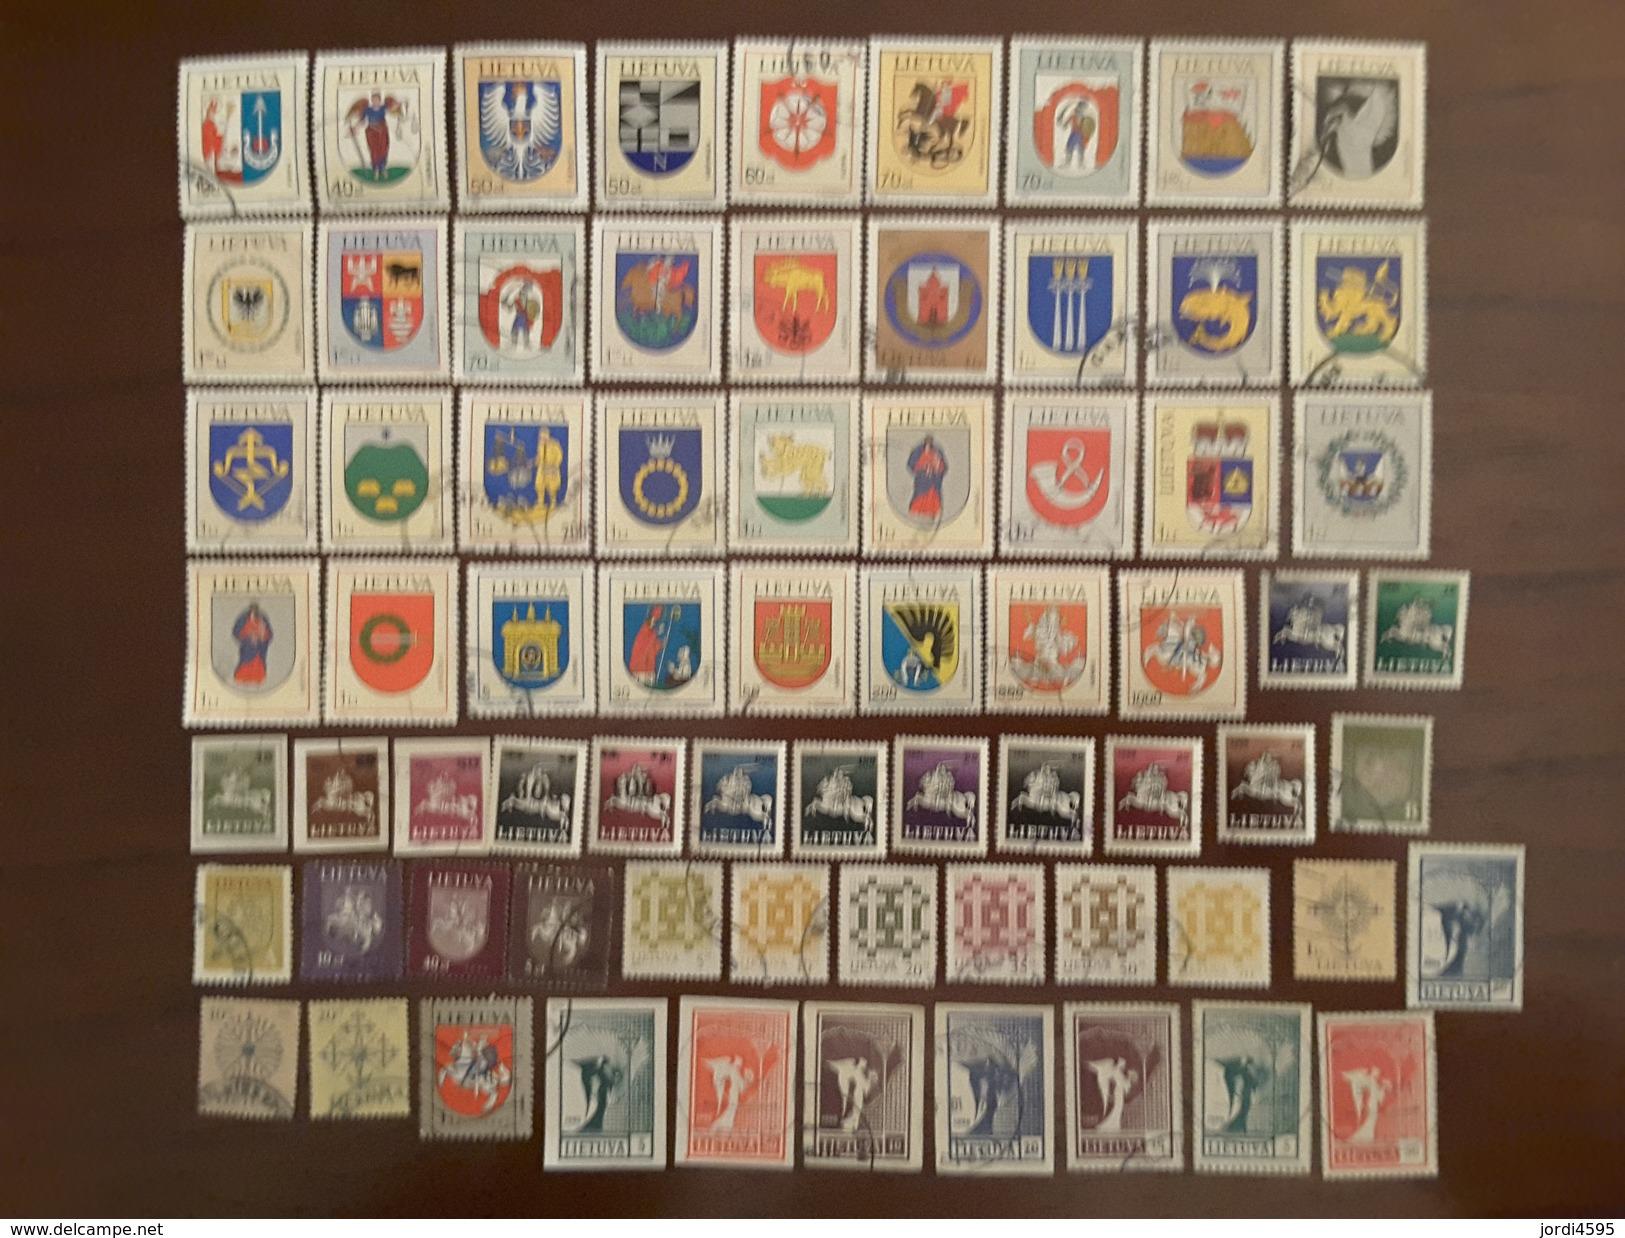 Lituania Used 251 Stamps +  3 Blocks - Lithuania